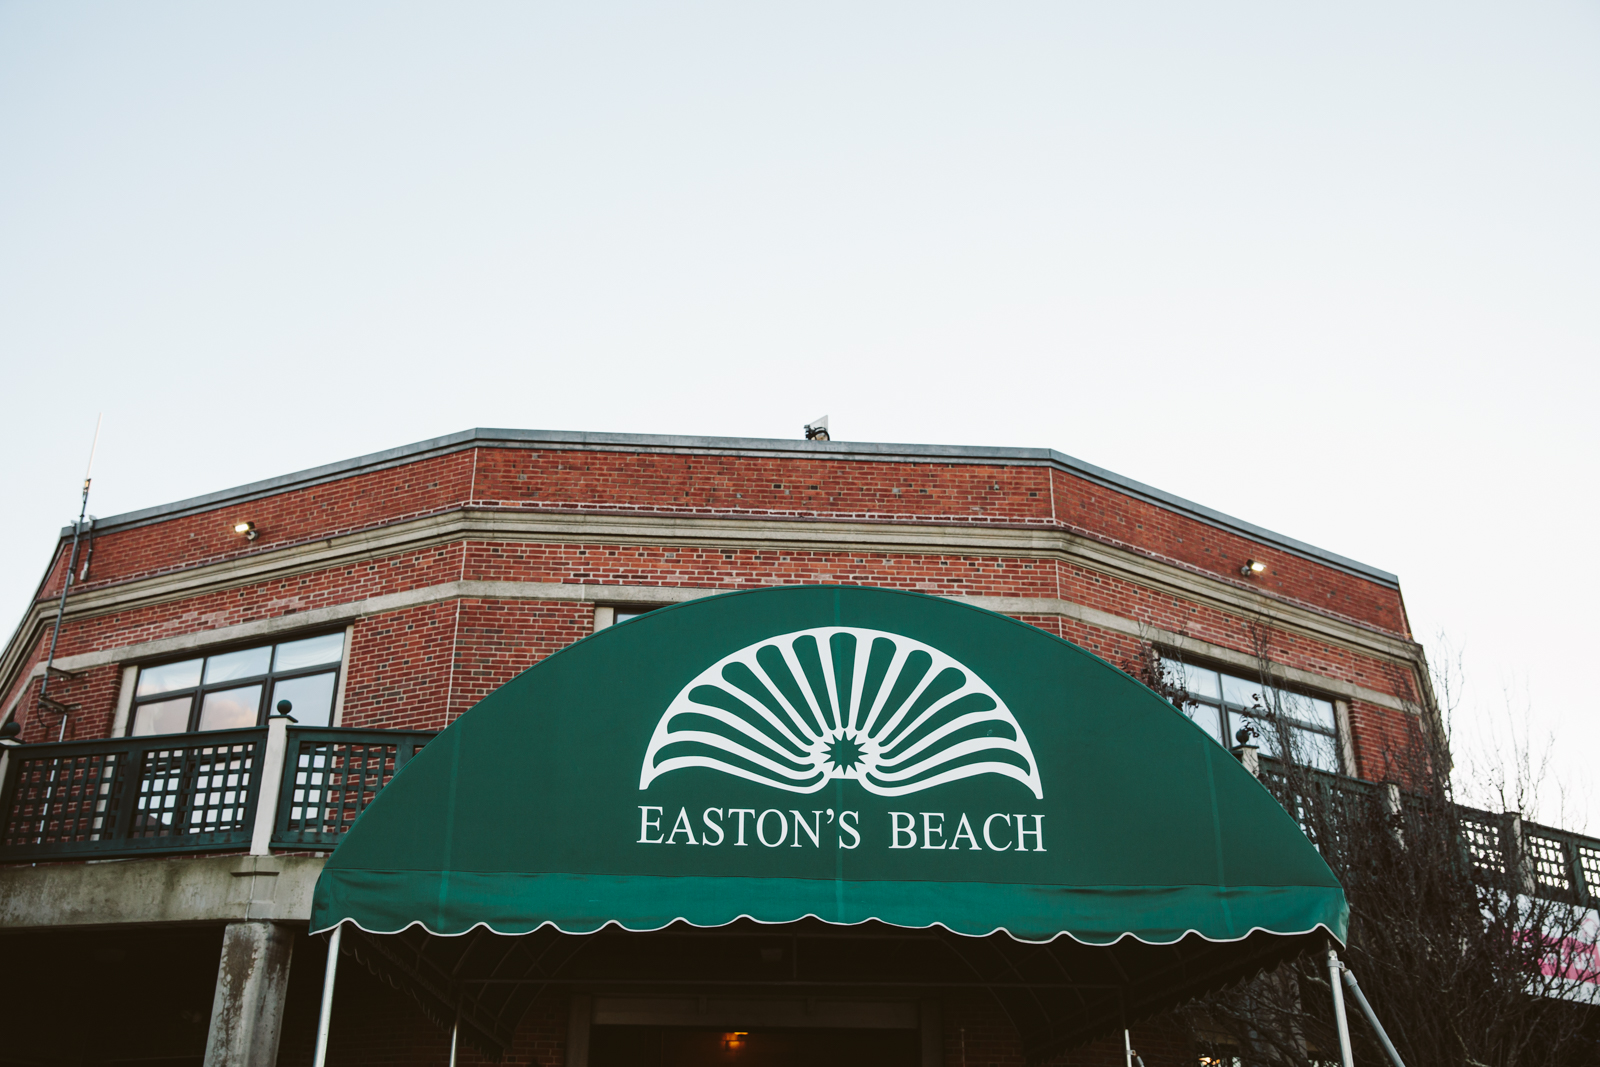 eastons beach rotunda ballroom